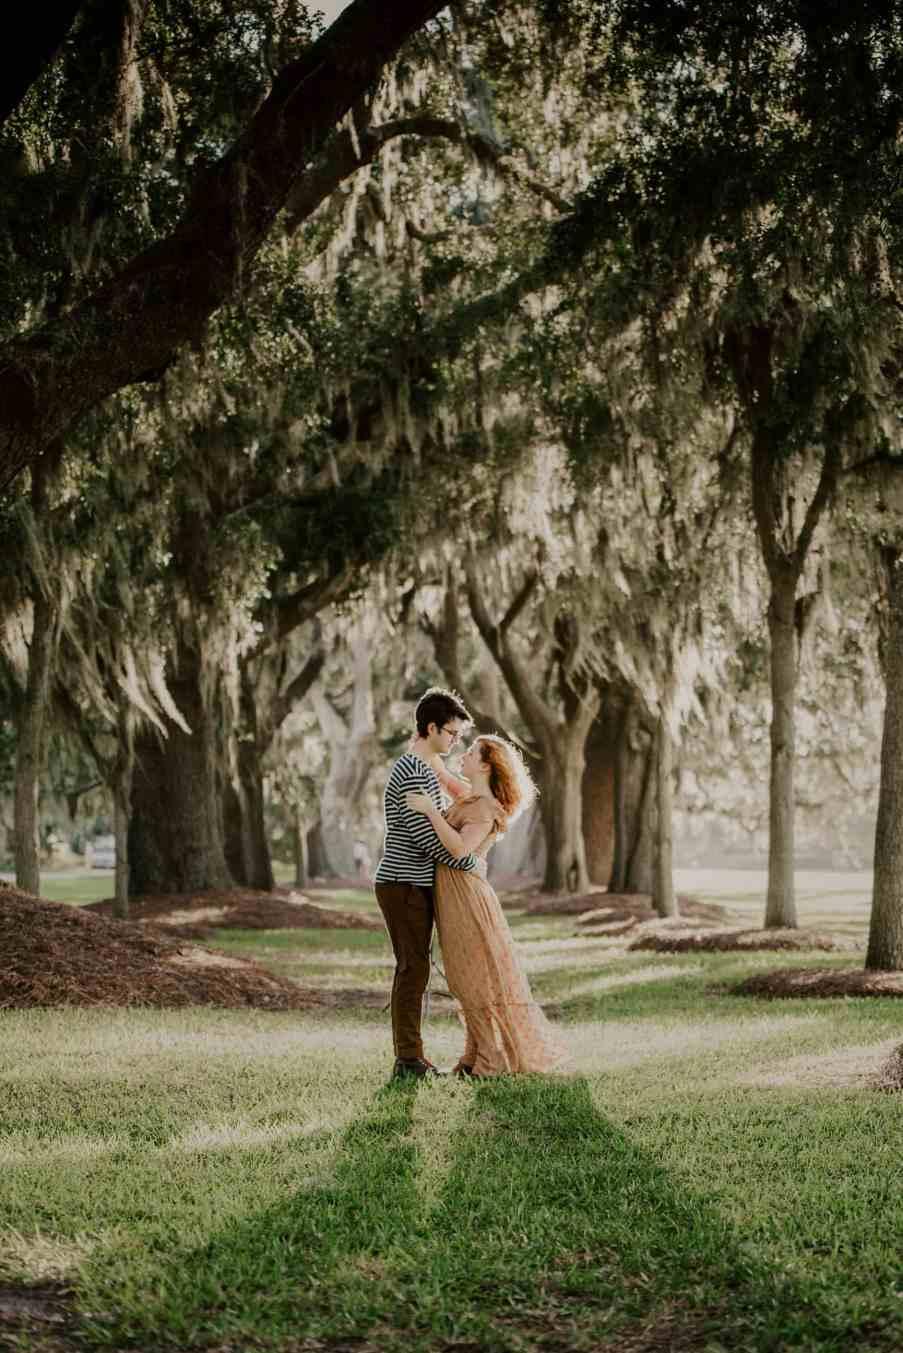 Back-lit photo under the mossy oaks